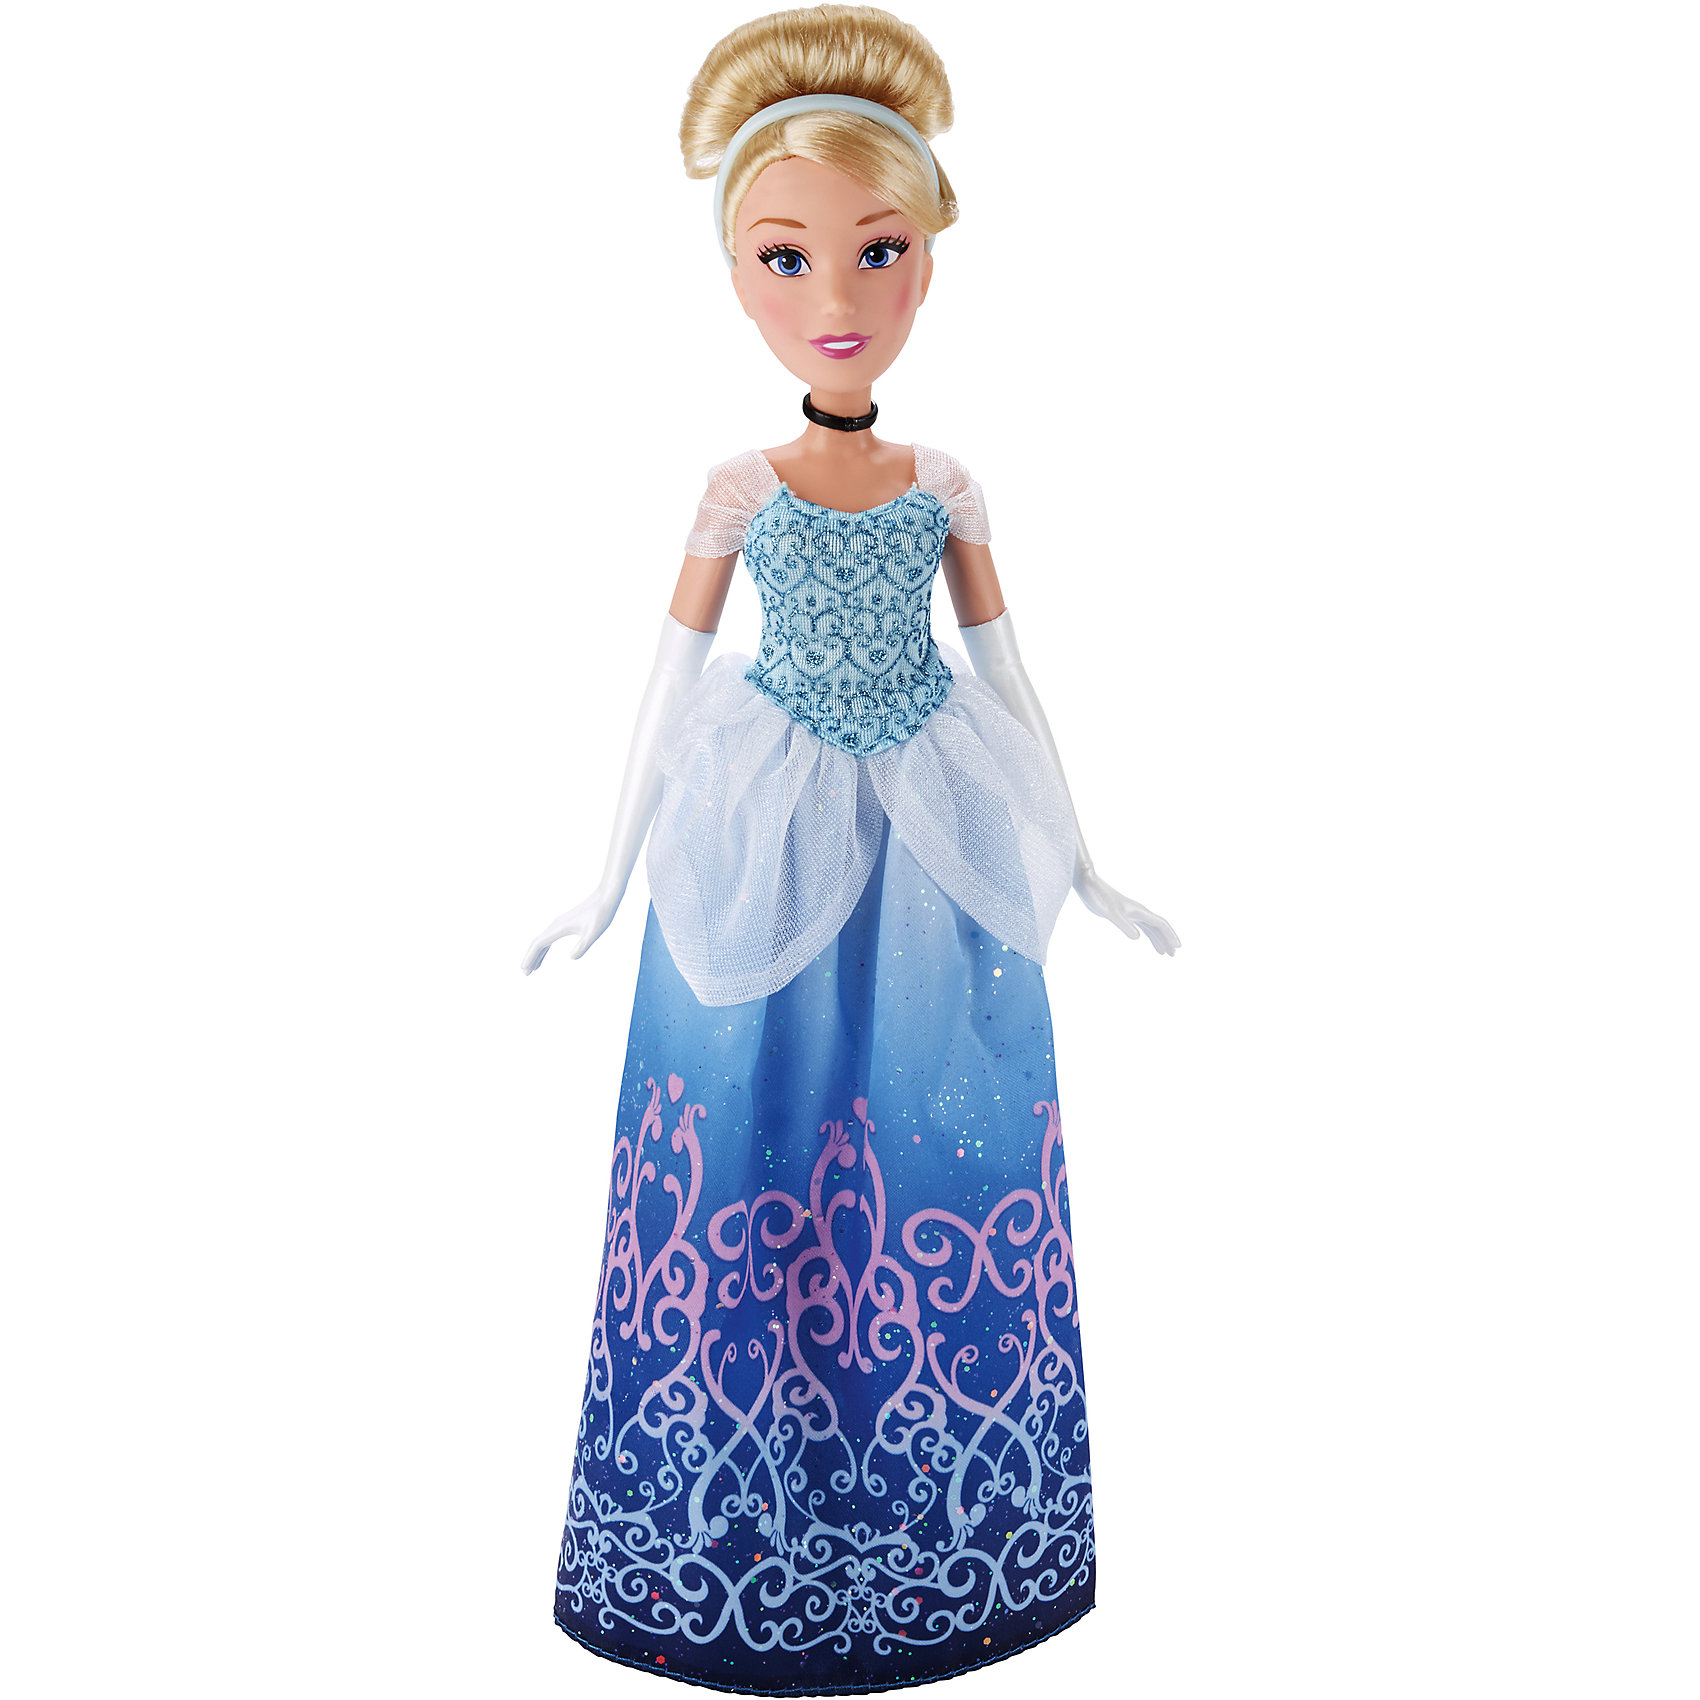 Hasbro Кукла Золушка, Принцессы Дисней hasbro мини кукла принцессы дисней